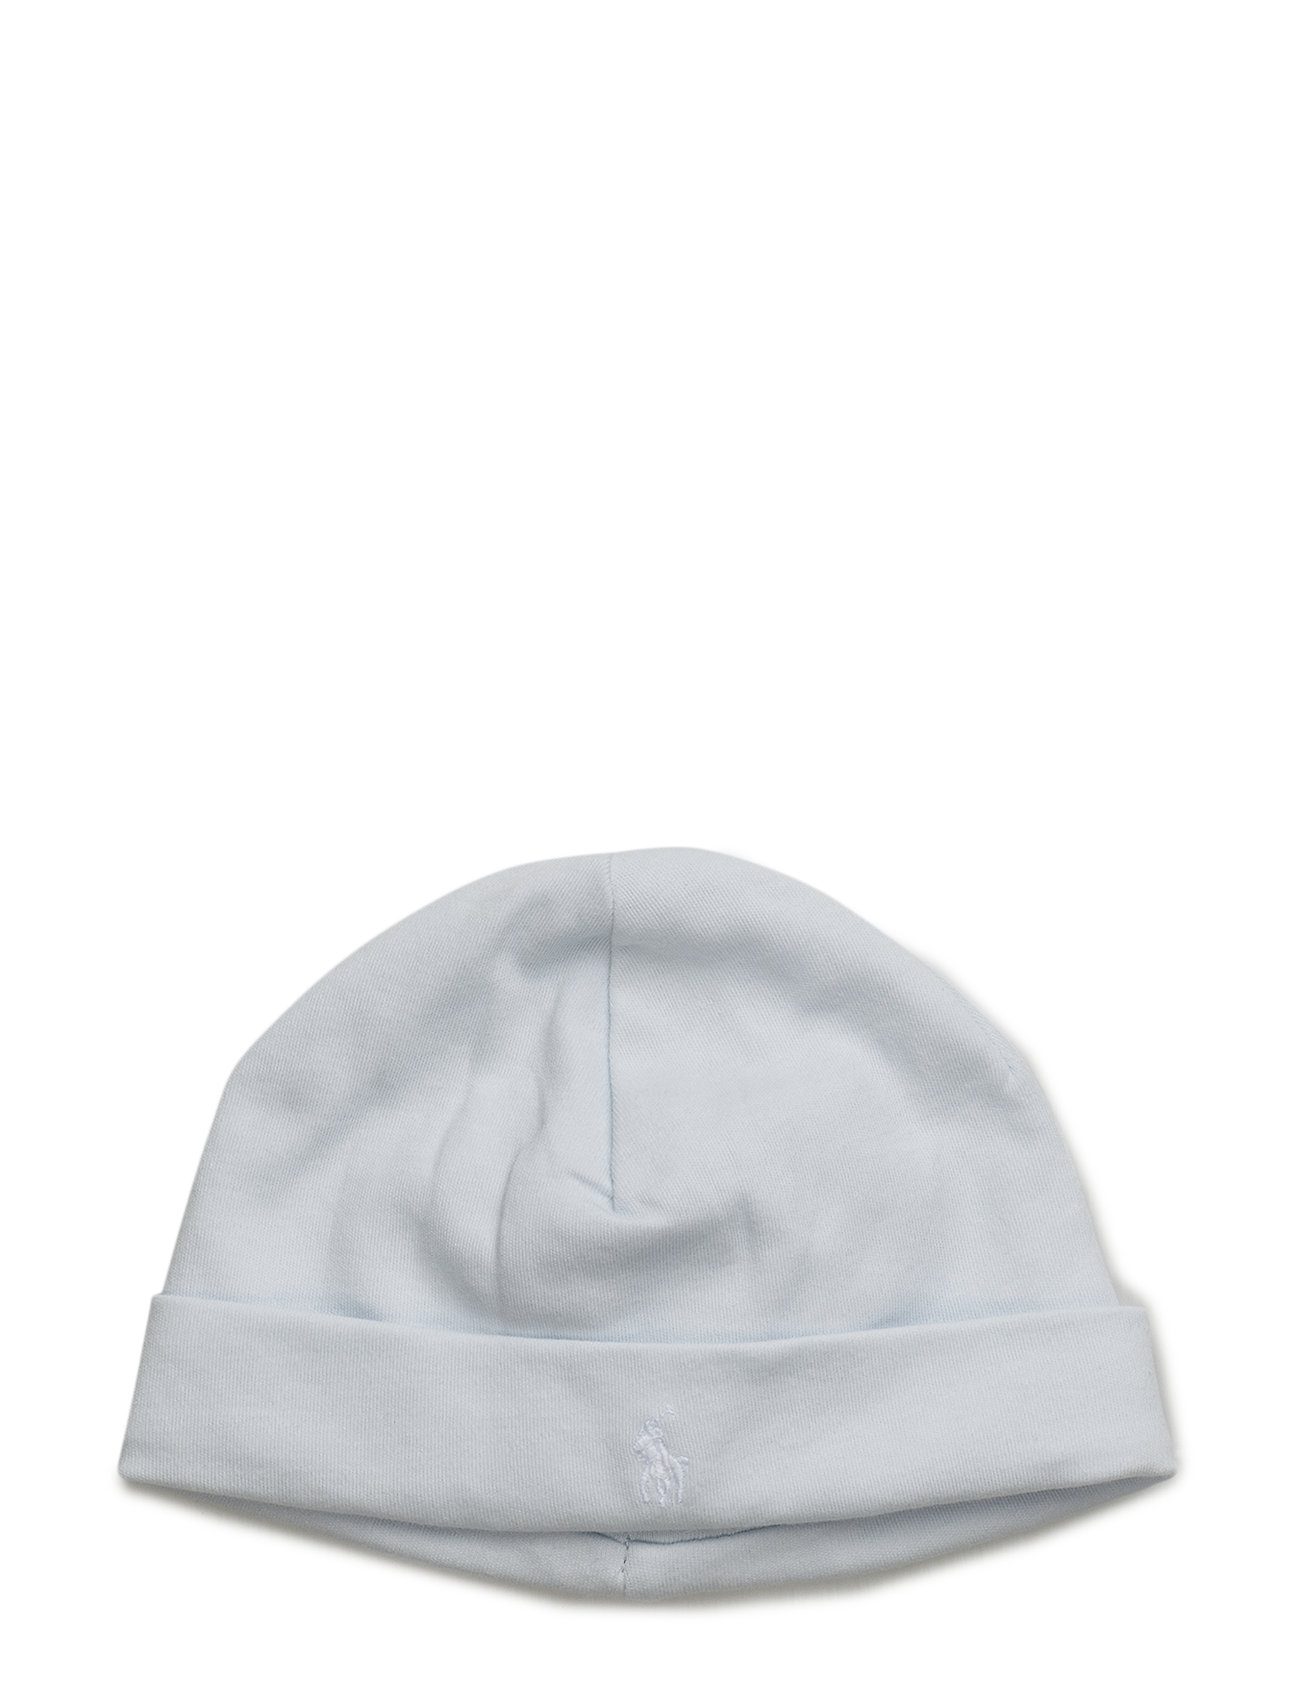 149ac9f9e Black Flat Cap Baby